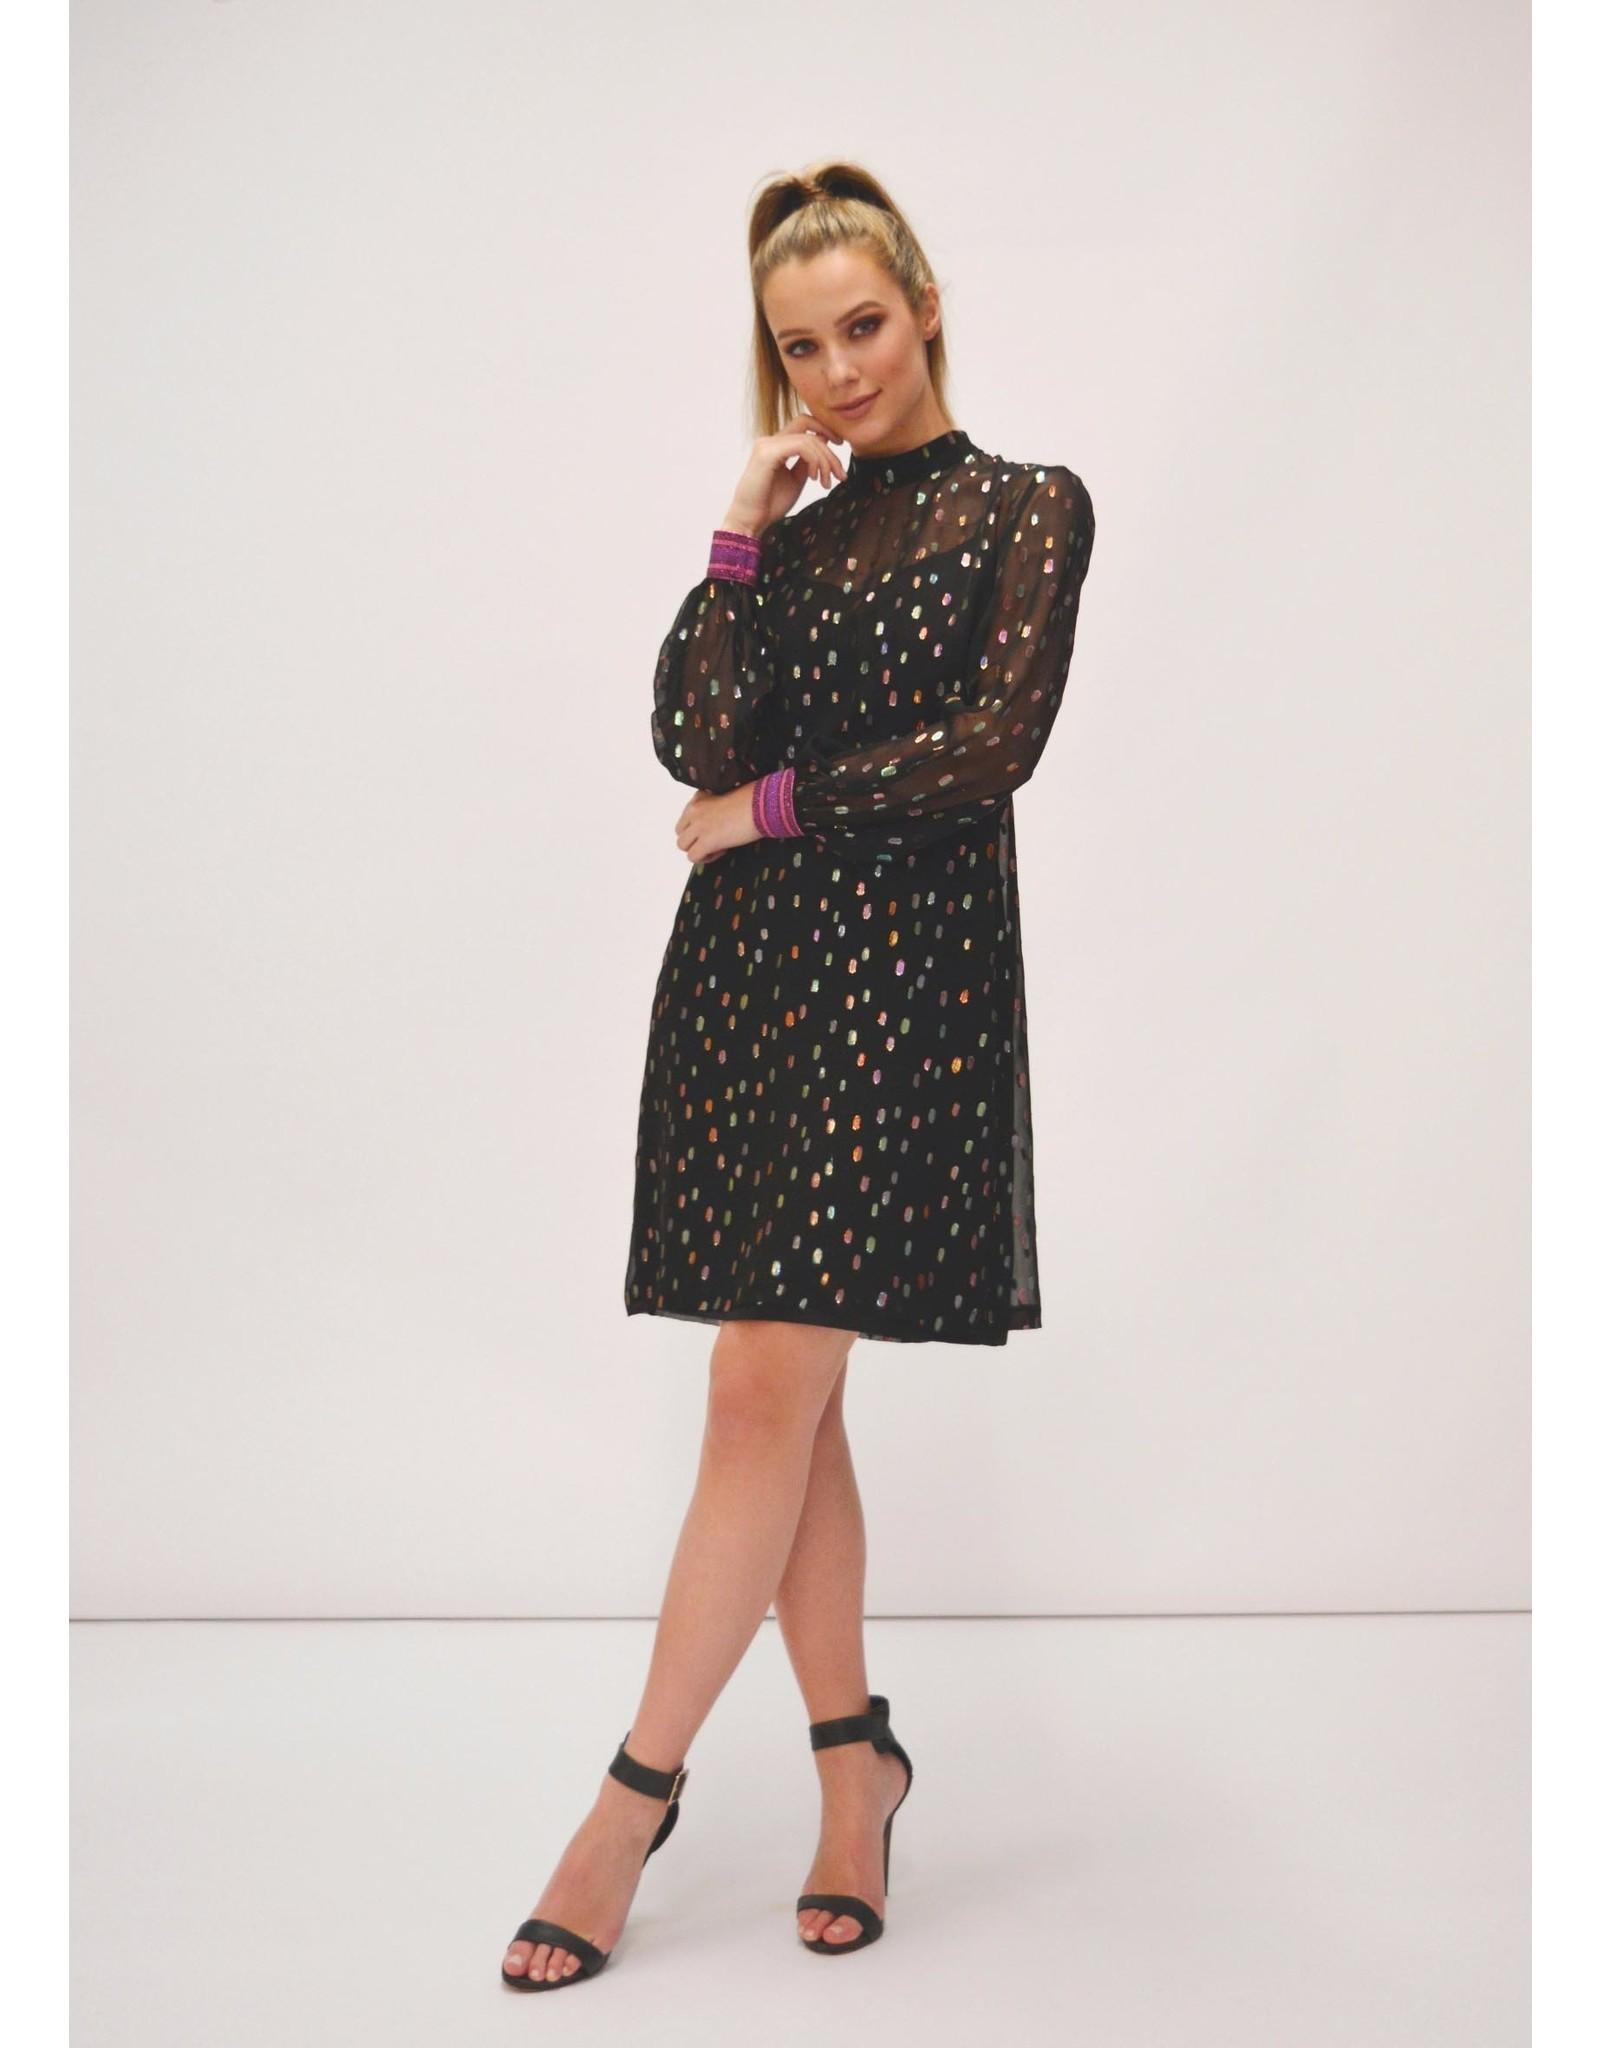 Fee G Lurex Sparkle Short Black Dress